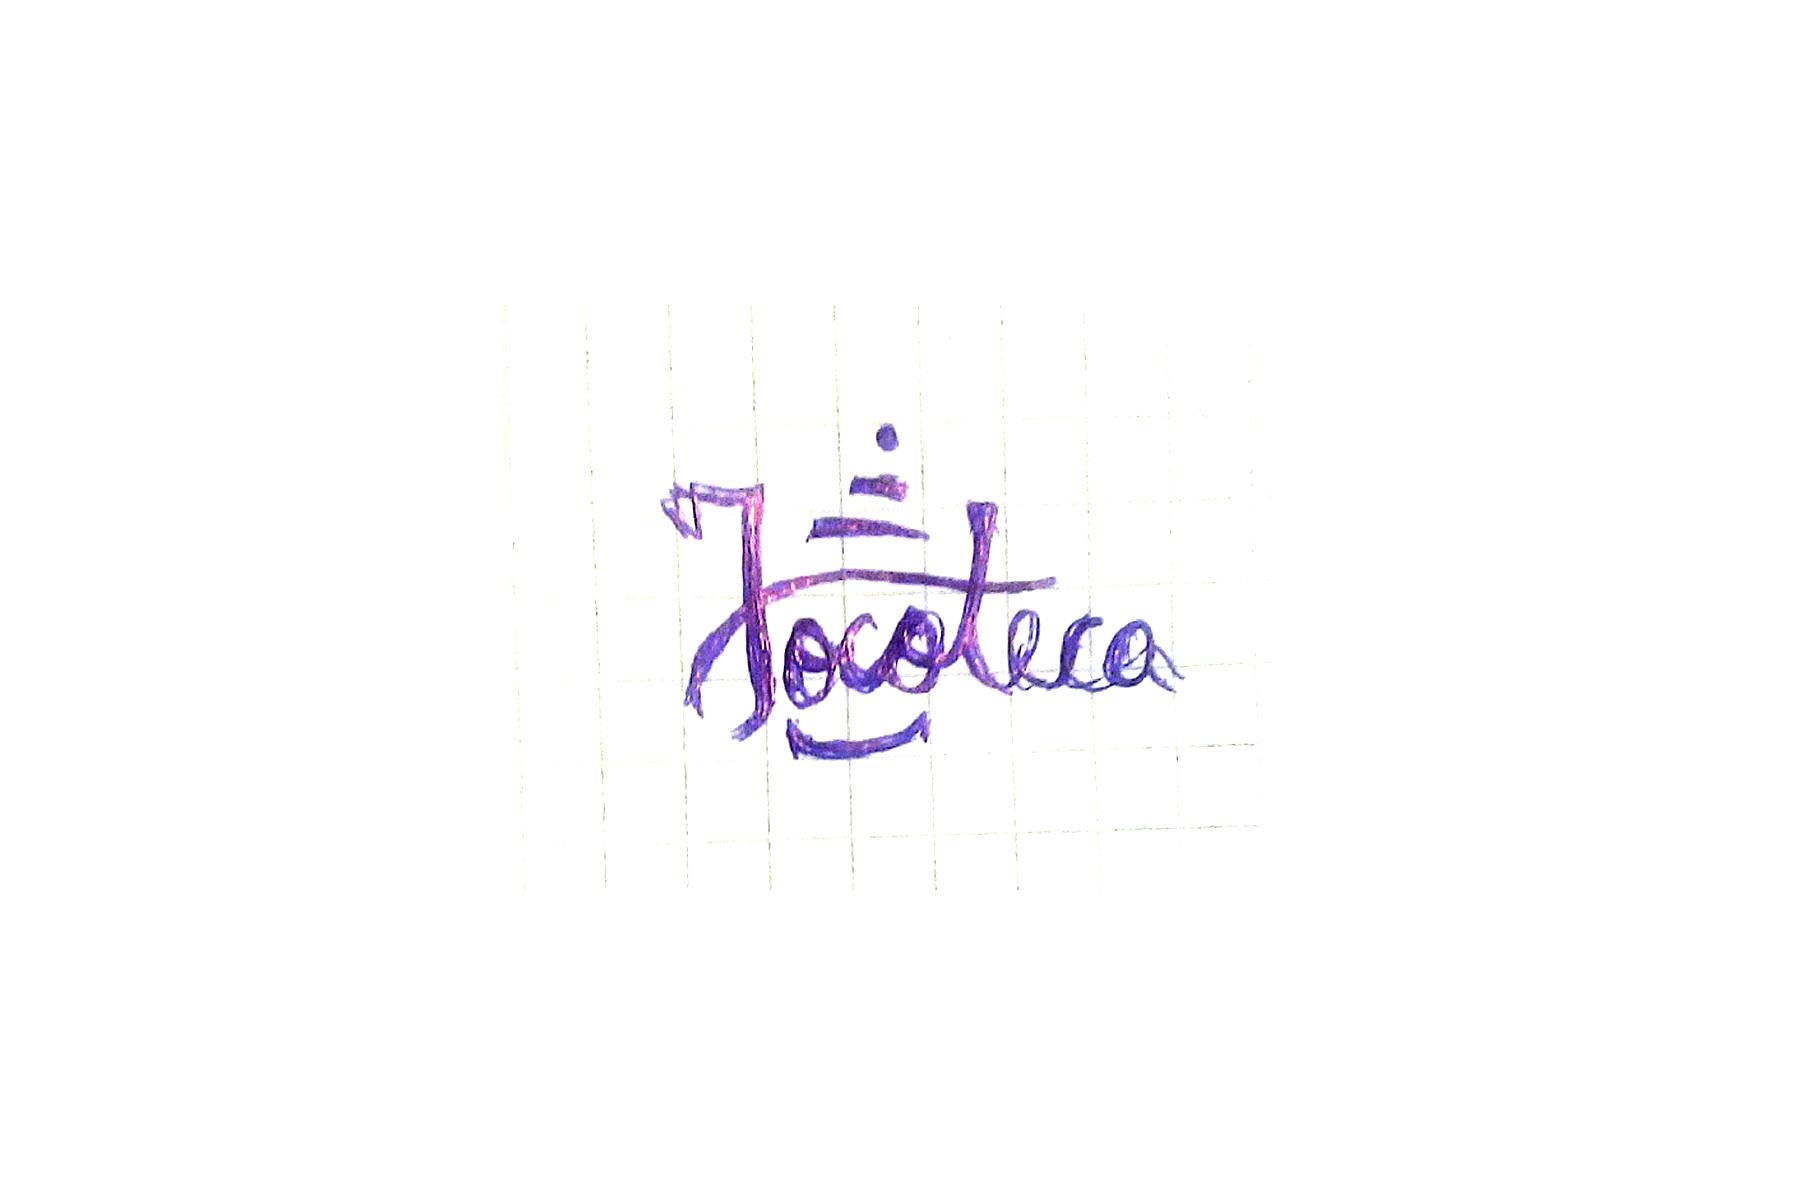 logo-design-before